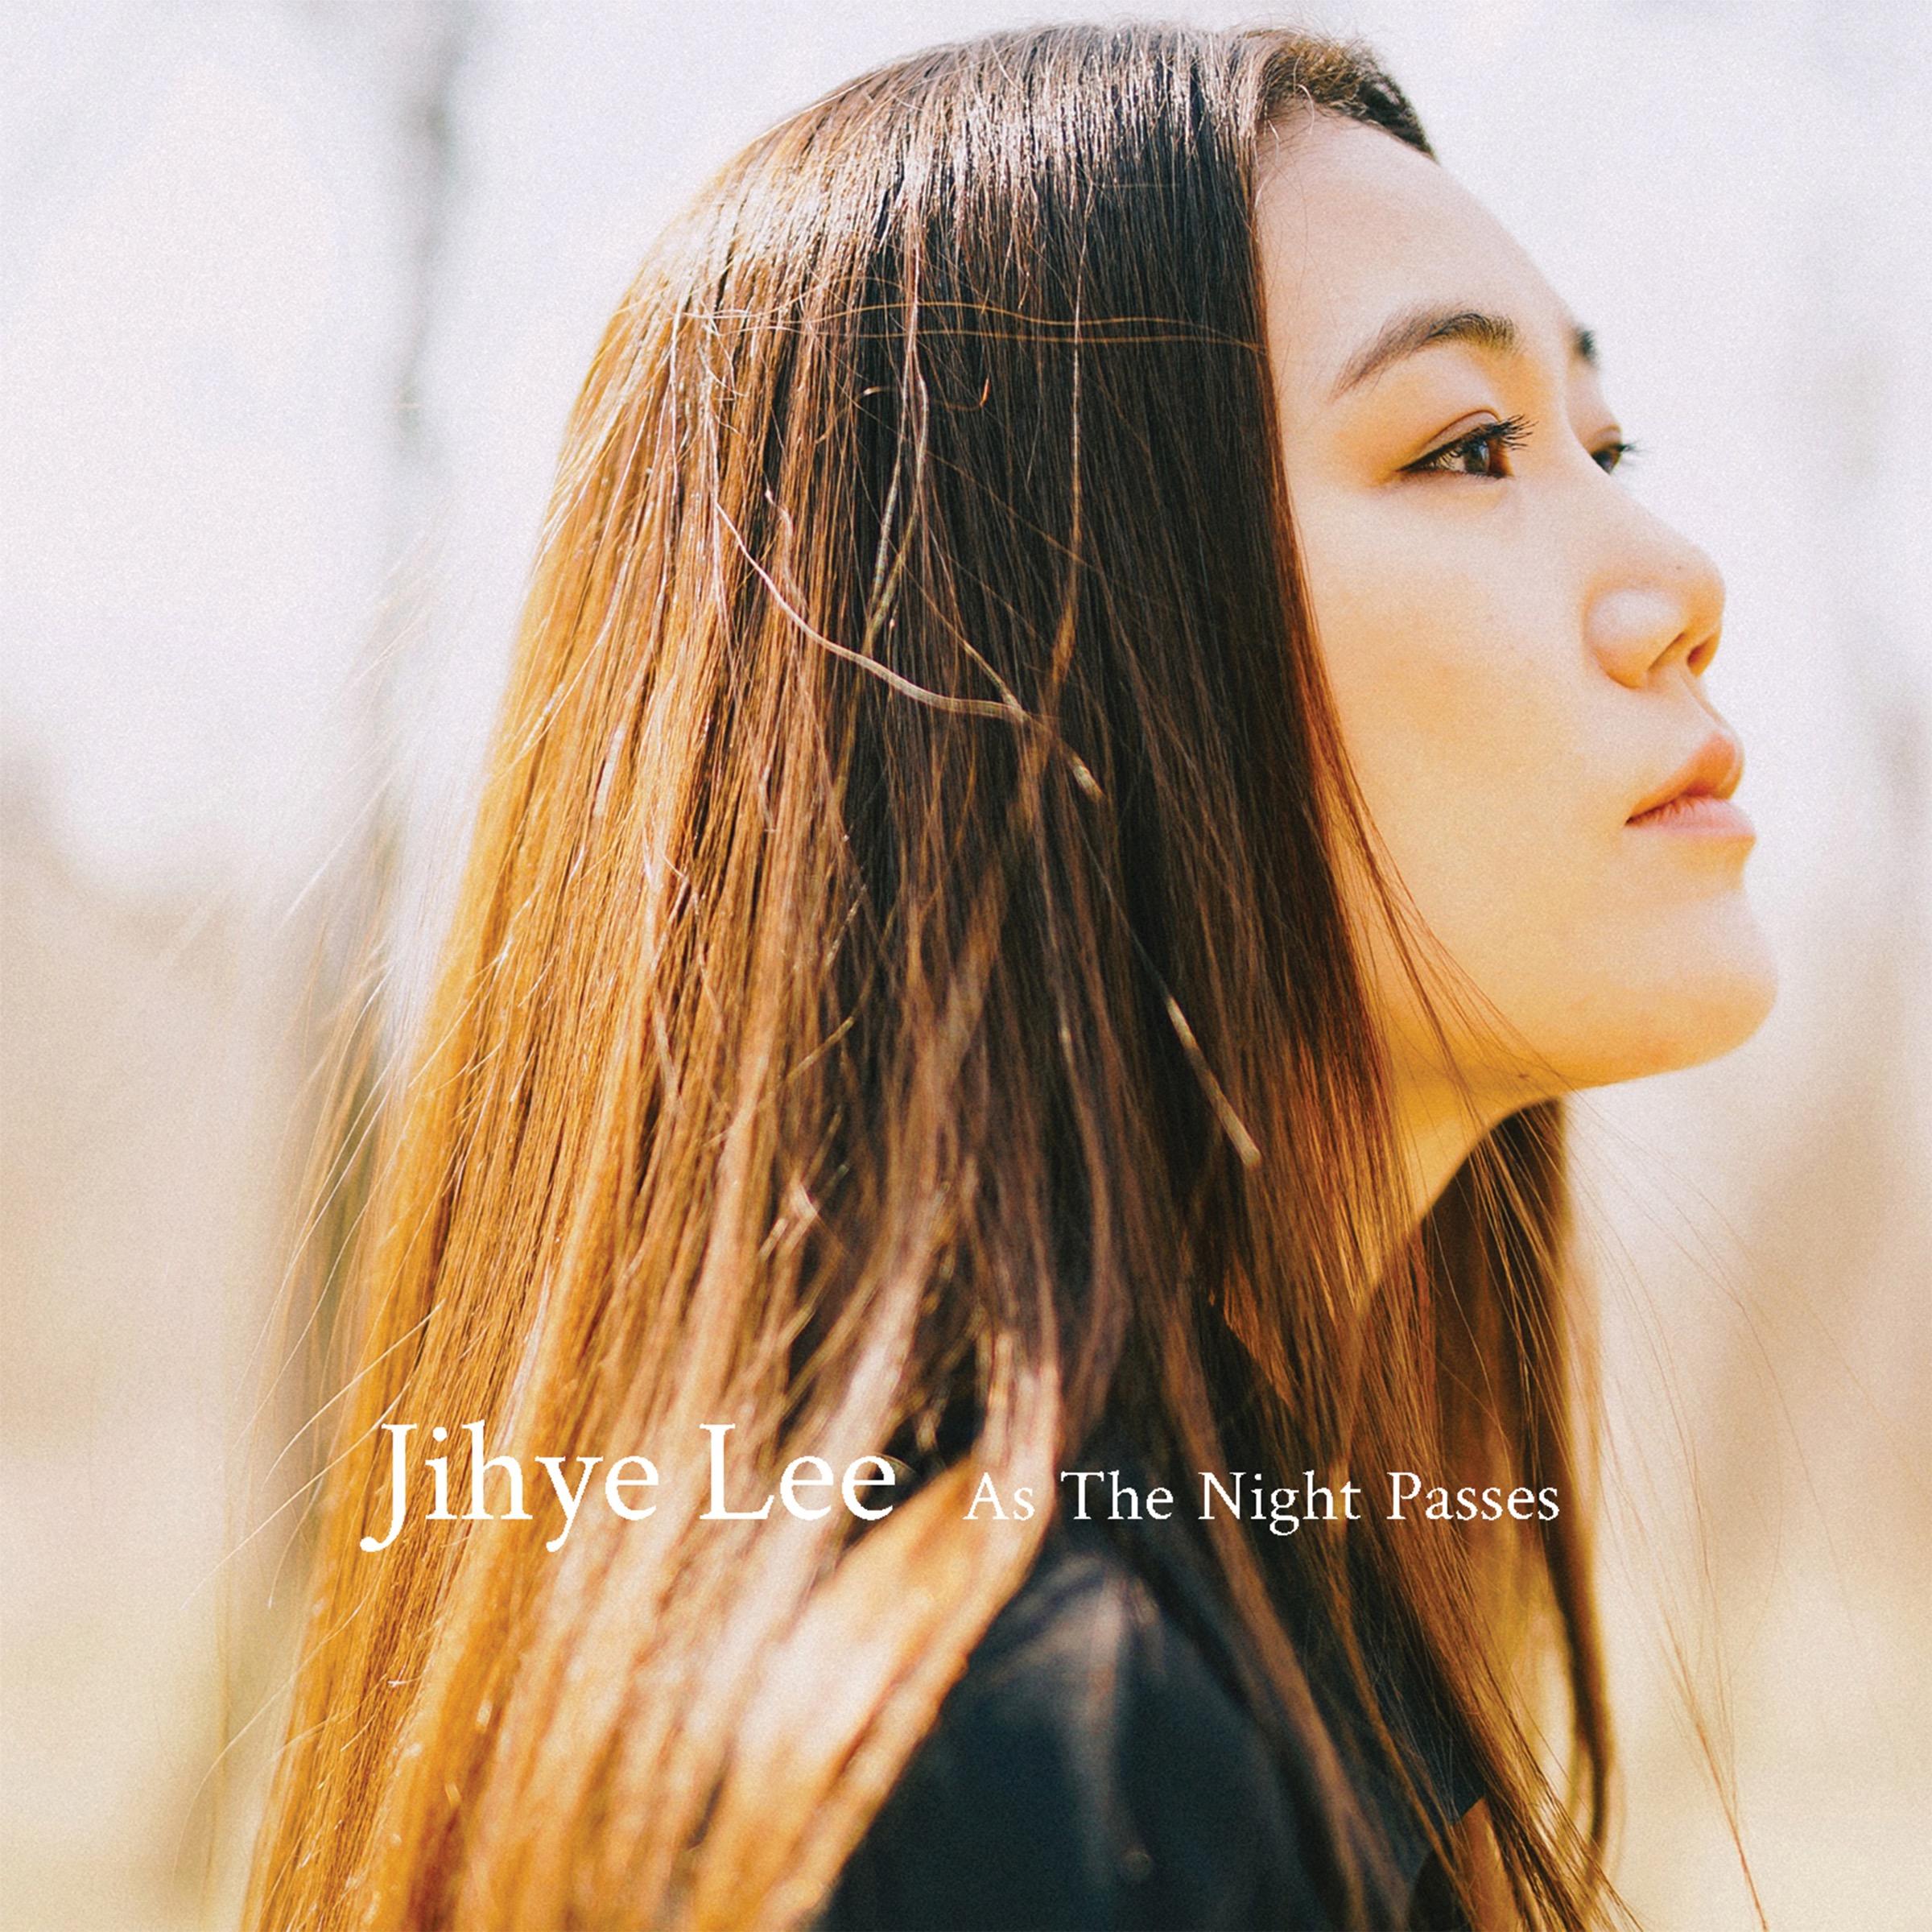 JihyeLee_CD_Cover- copy_web.jpg